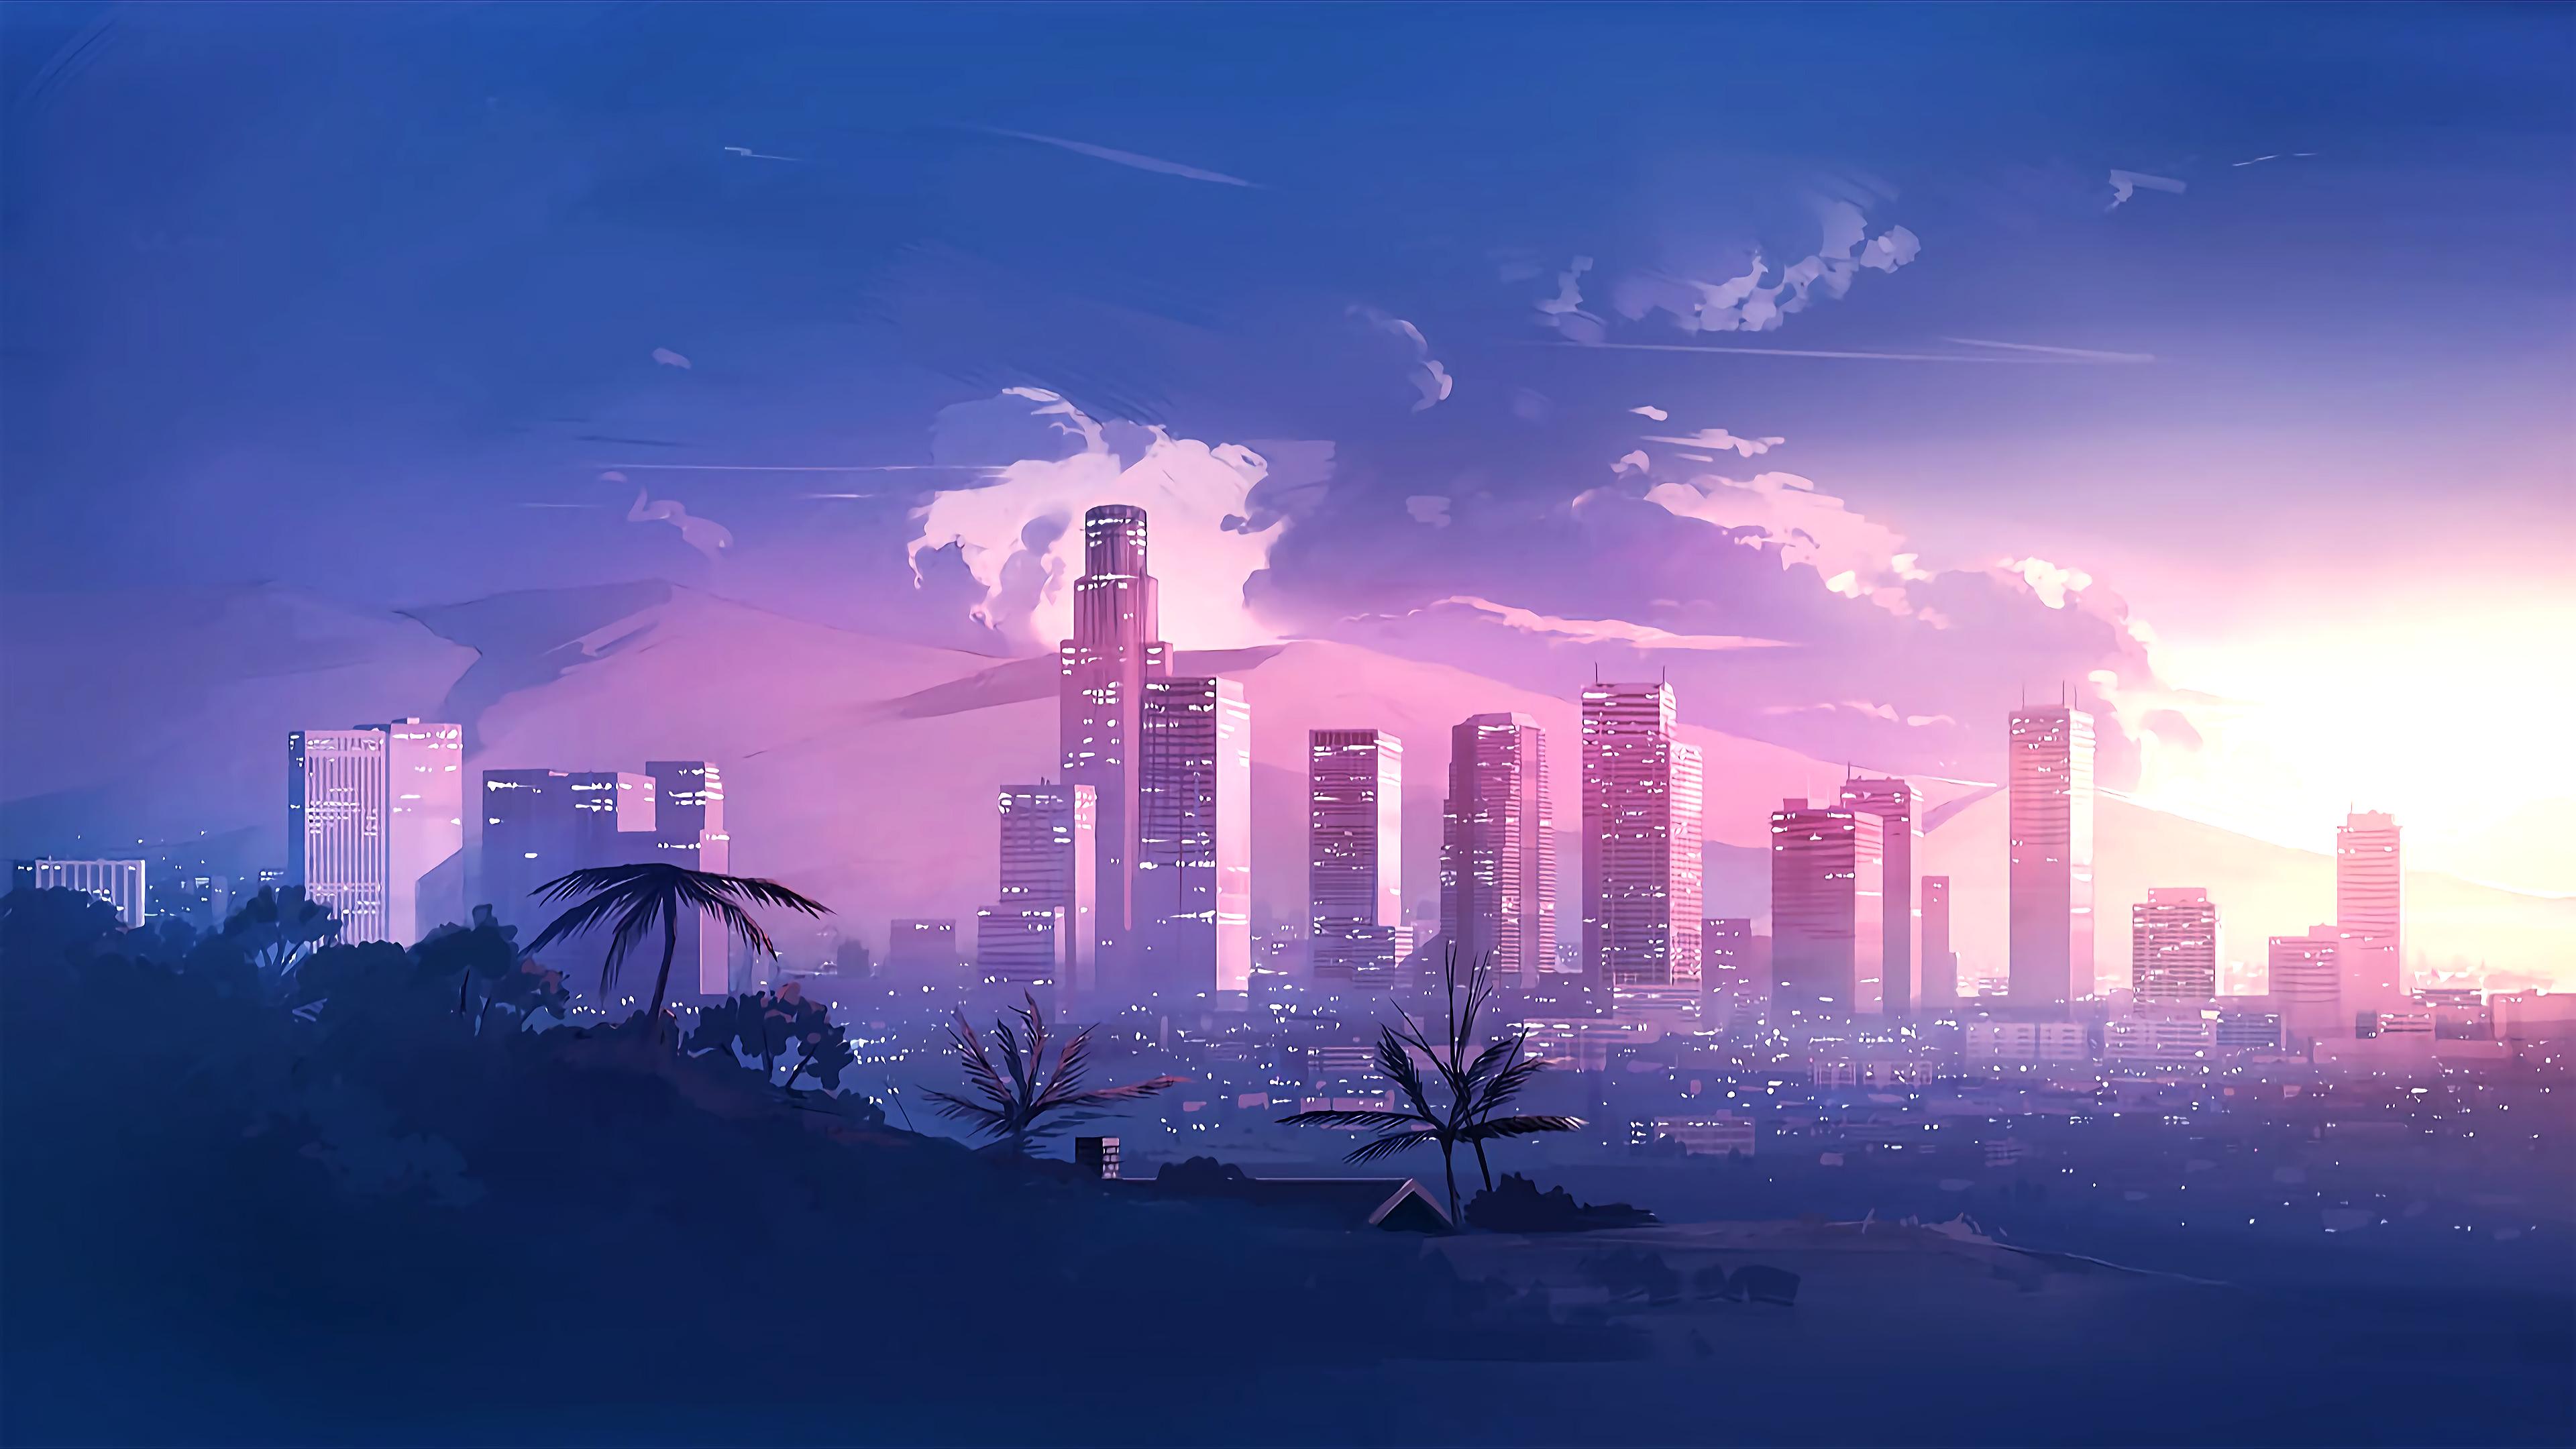 Los Angeles Break of Dawn (Seo Tatsuya) resized by Ze Robot